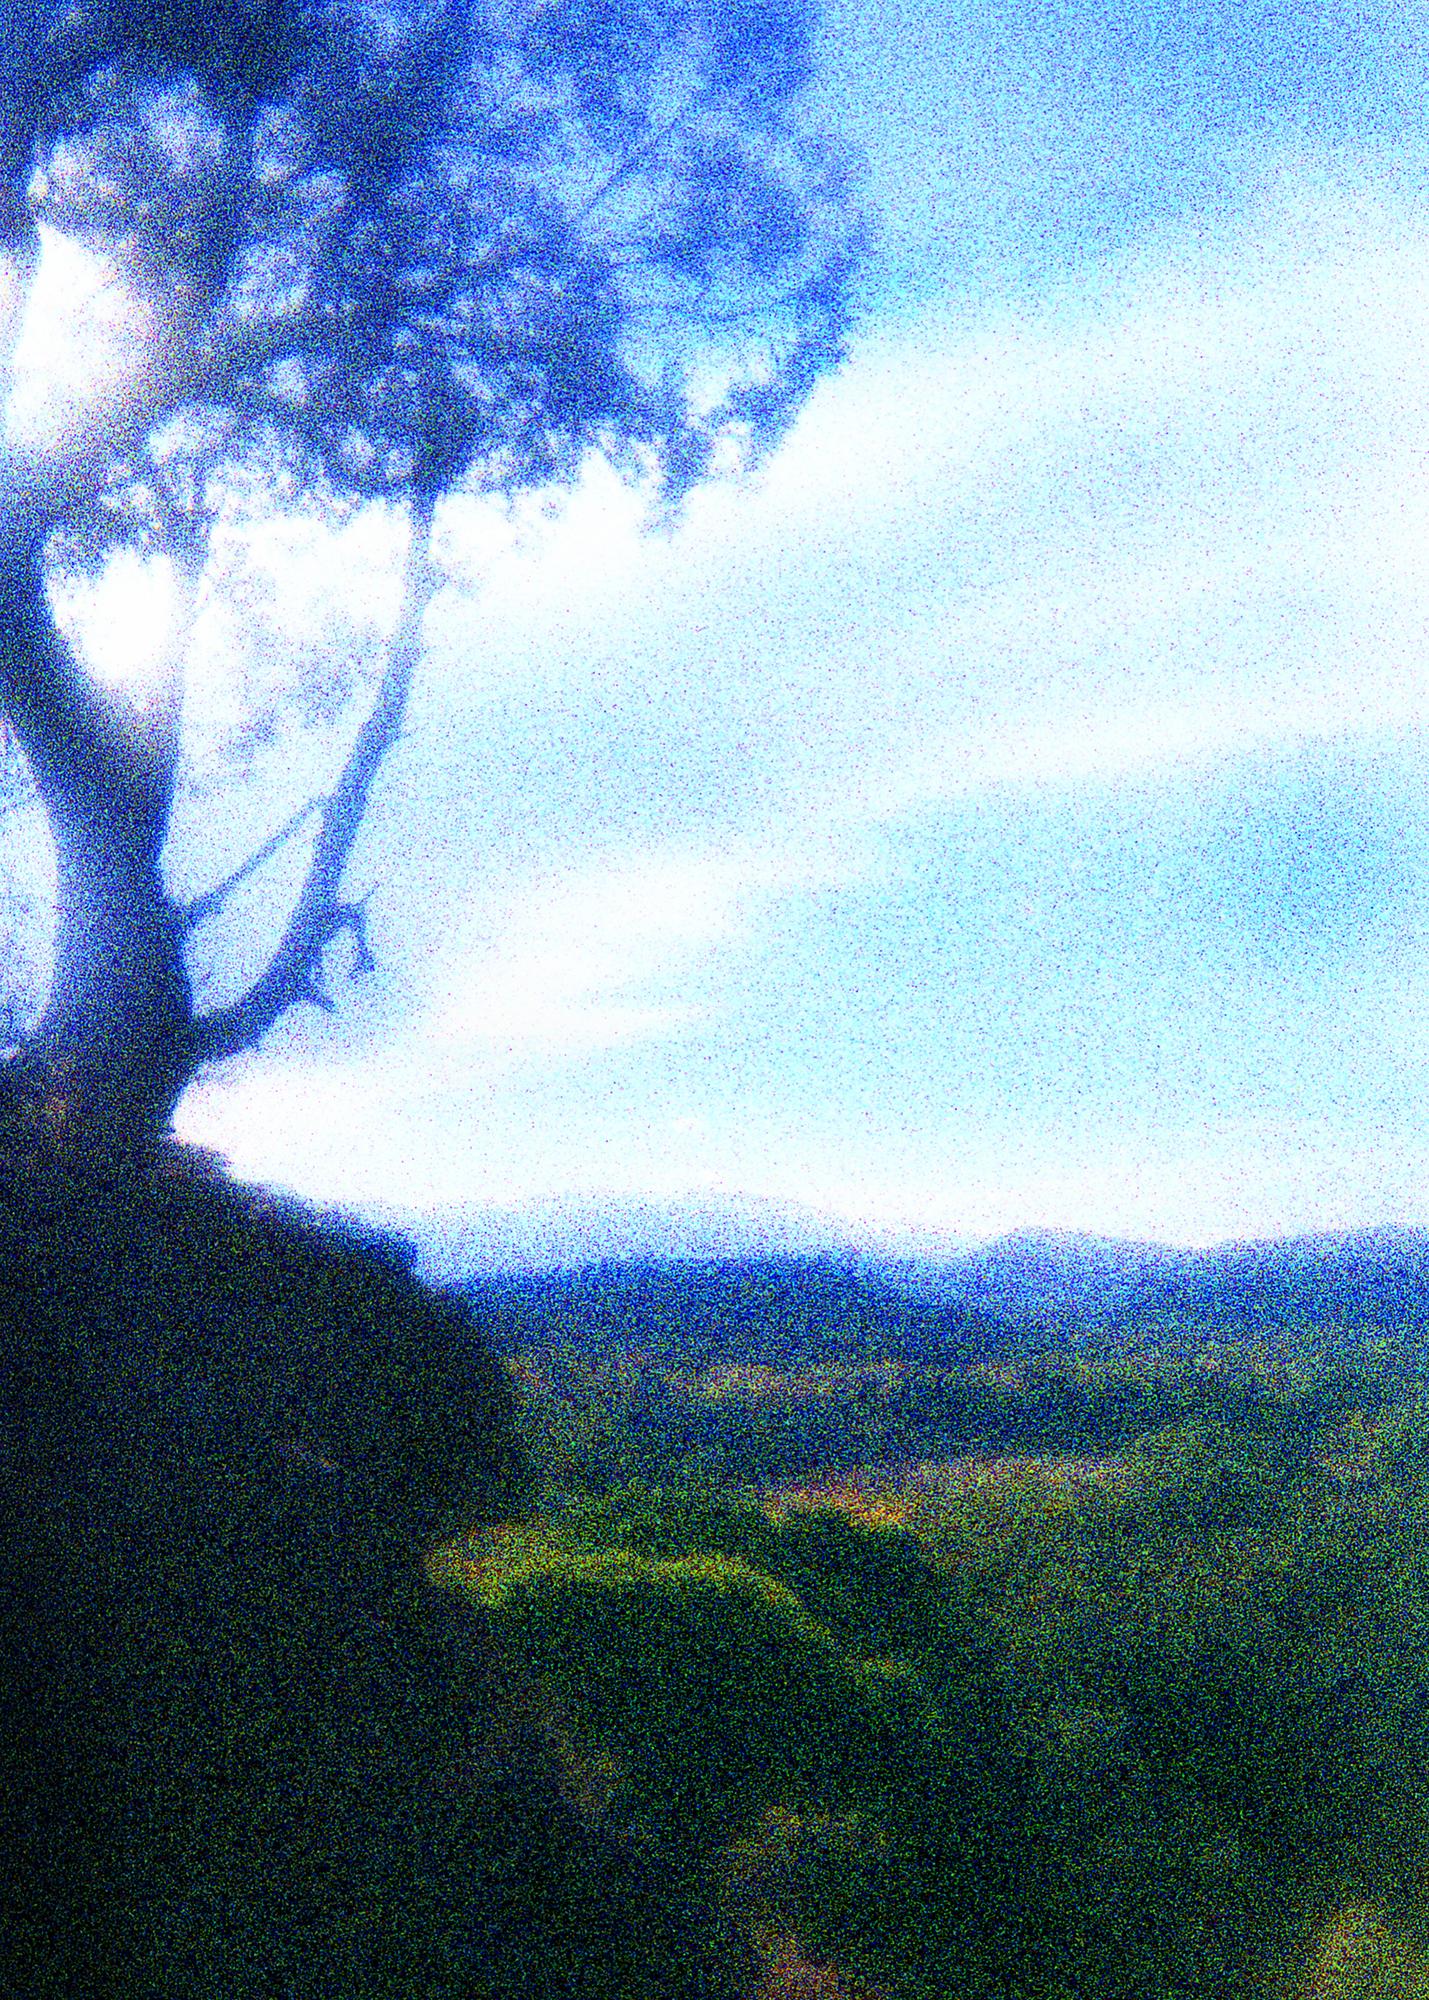 LandscapeTree5x7.jpg